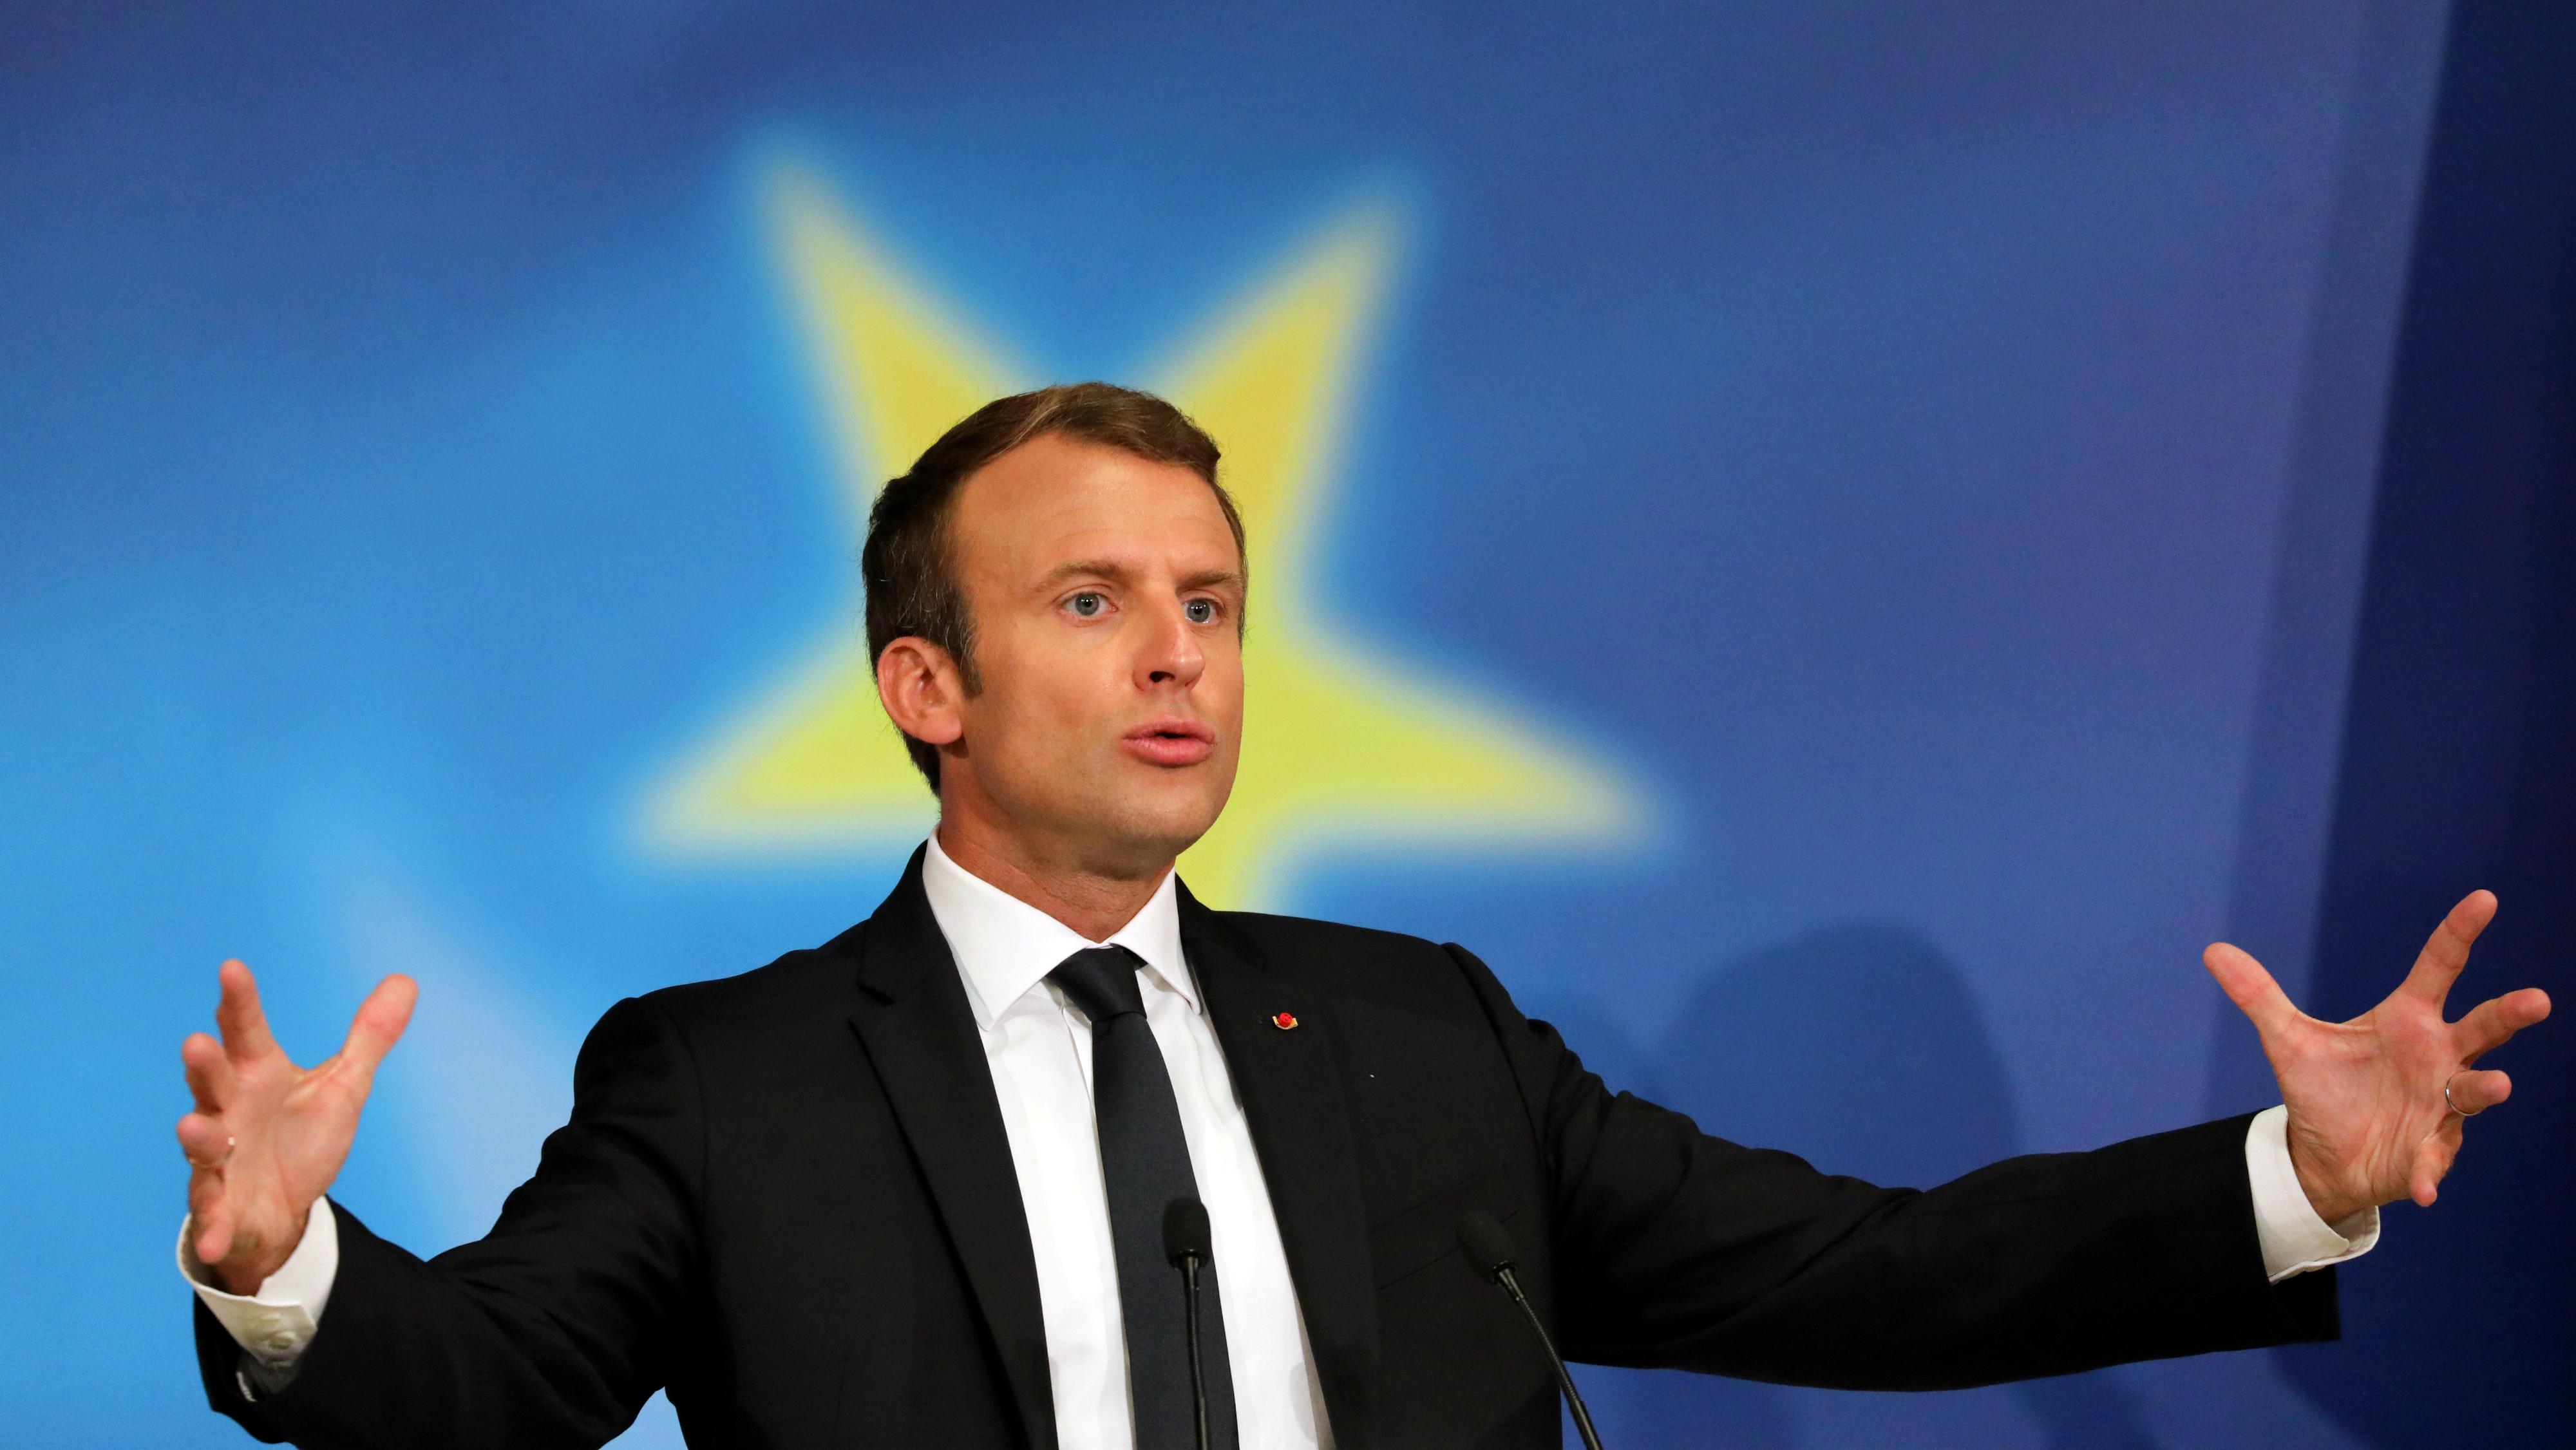 Emmanuel Macron at a lectern.